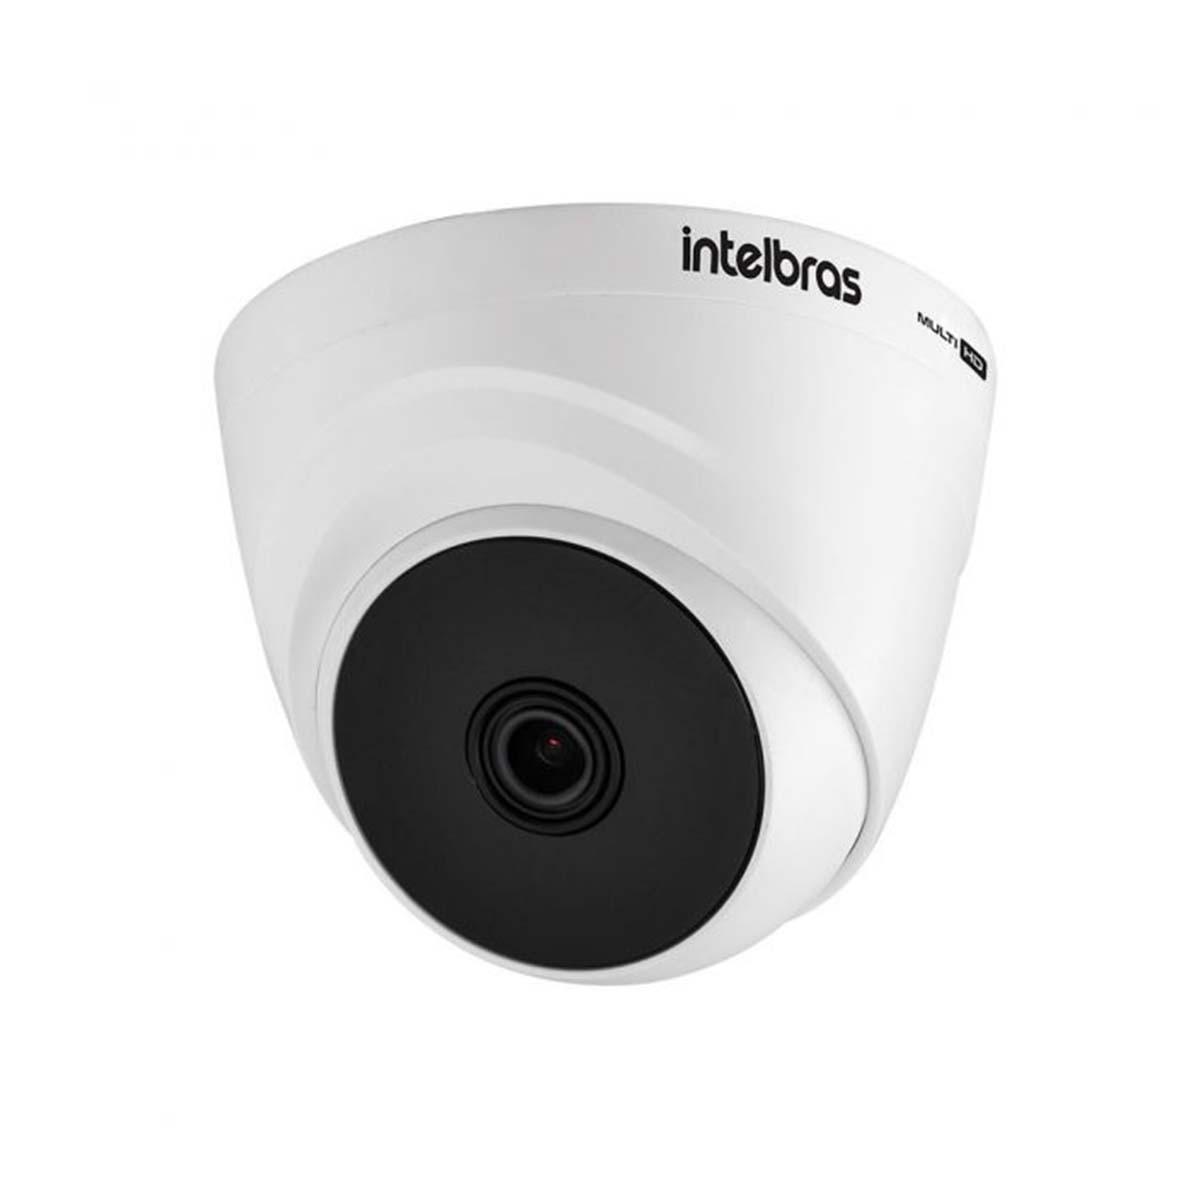 Câmera Dome Intelbras VHD 1010 D G6 720p  3,6mm